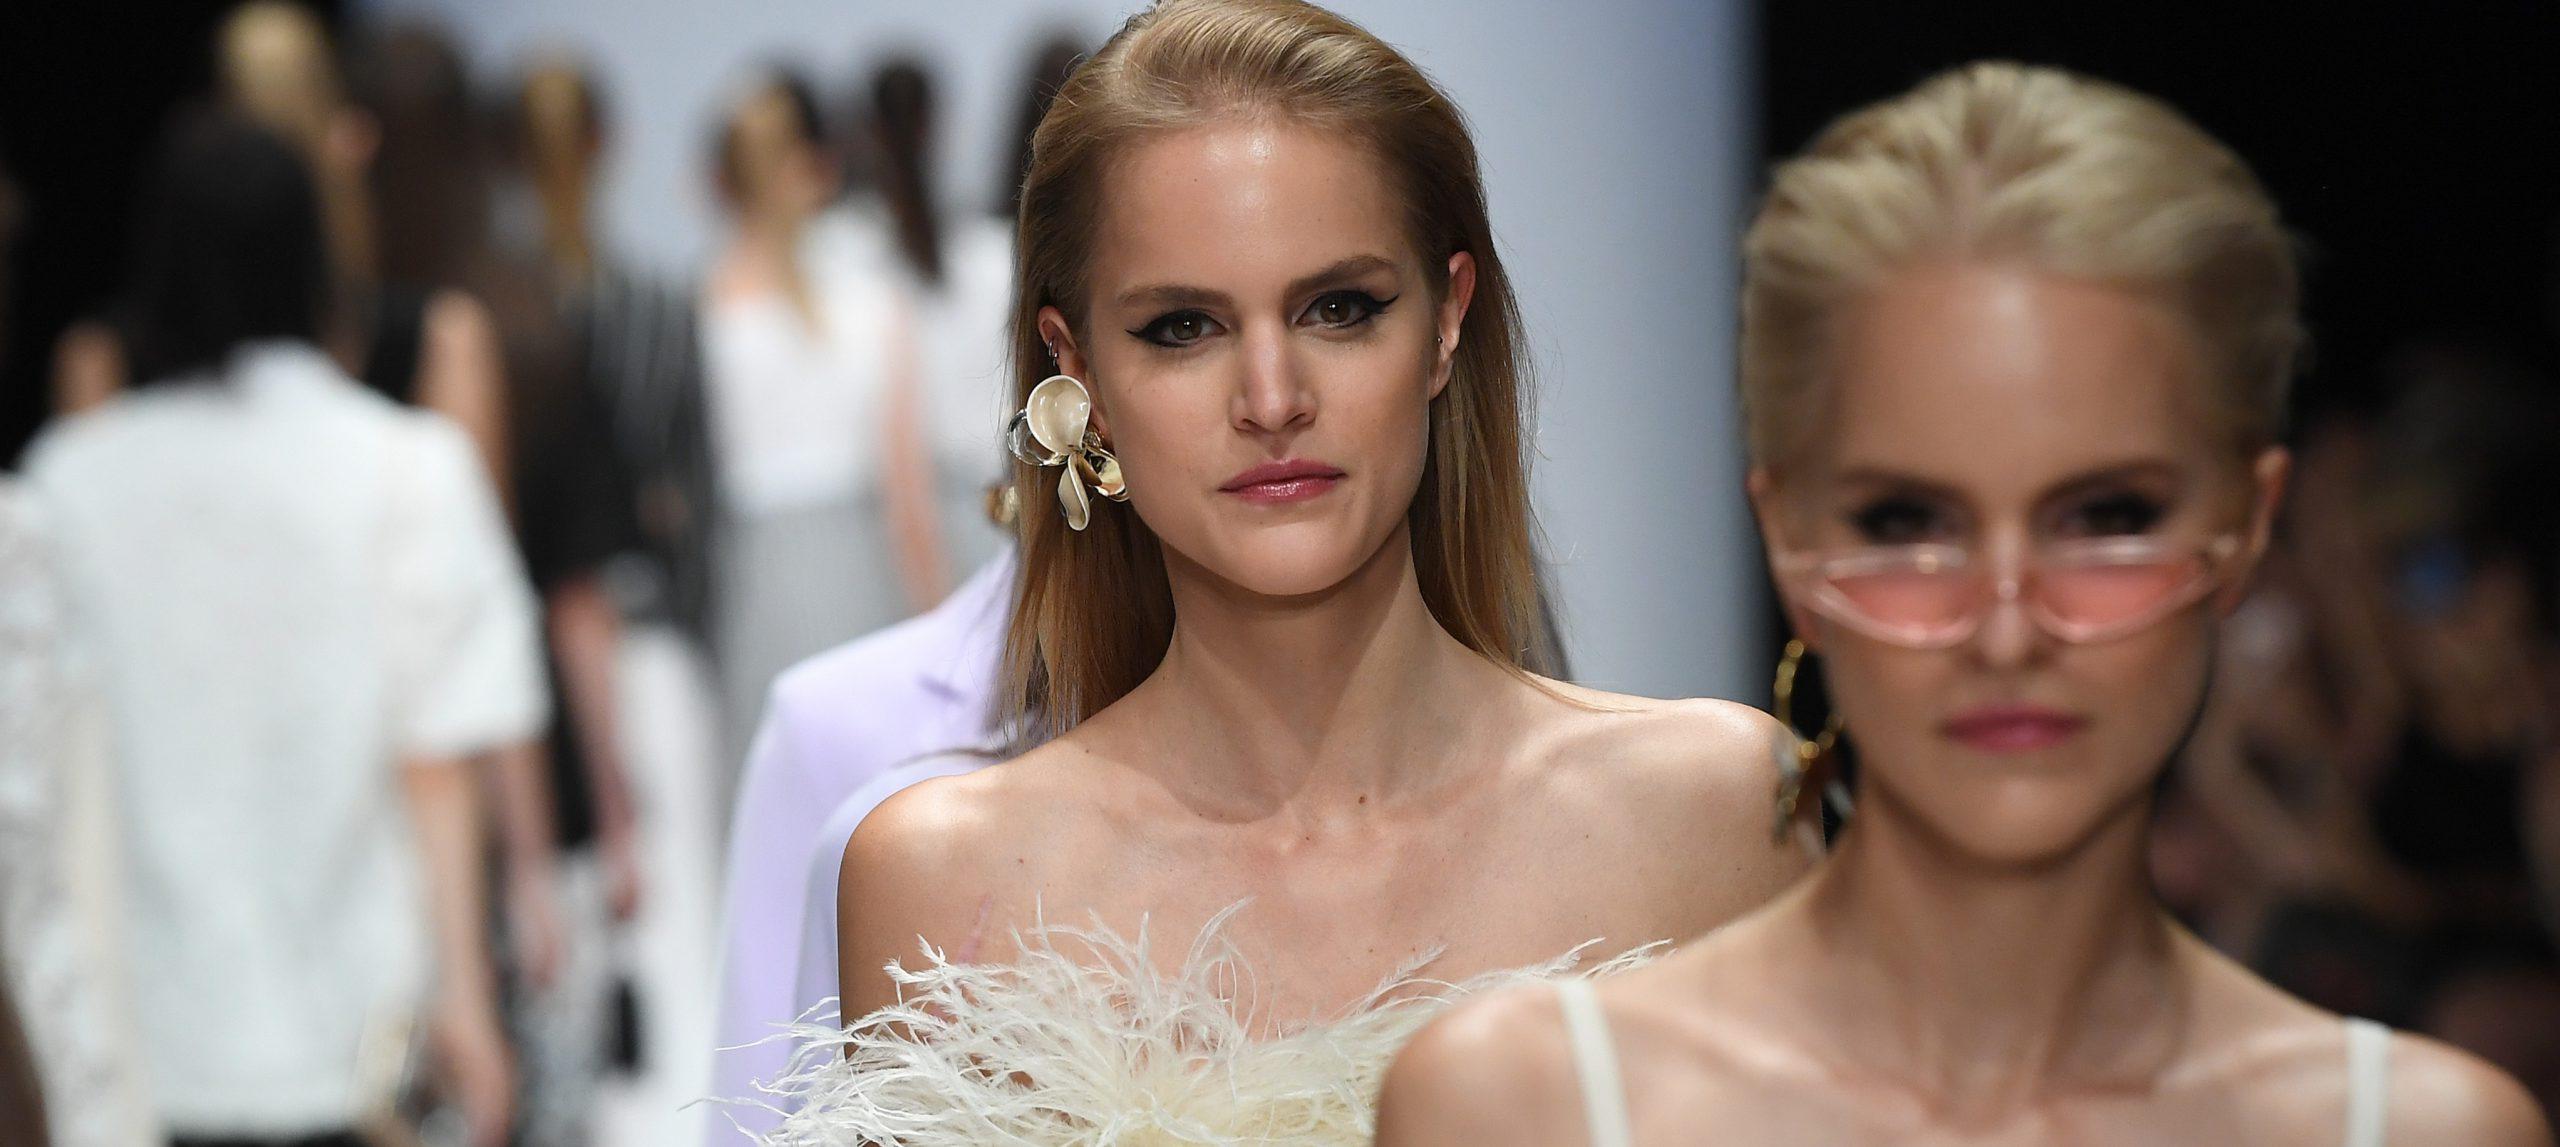 Mercedes Benz Fashion Week: RIANISTA'S BIG DREAM